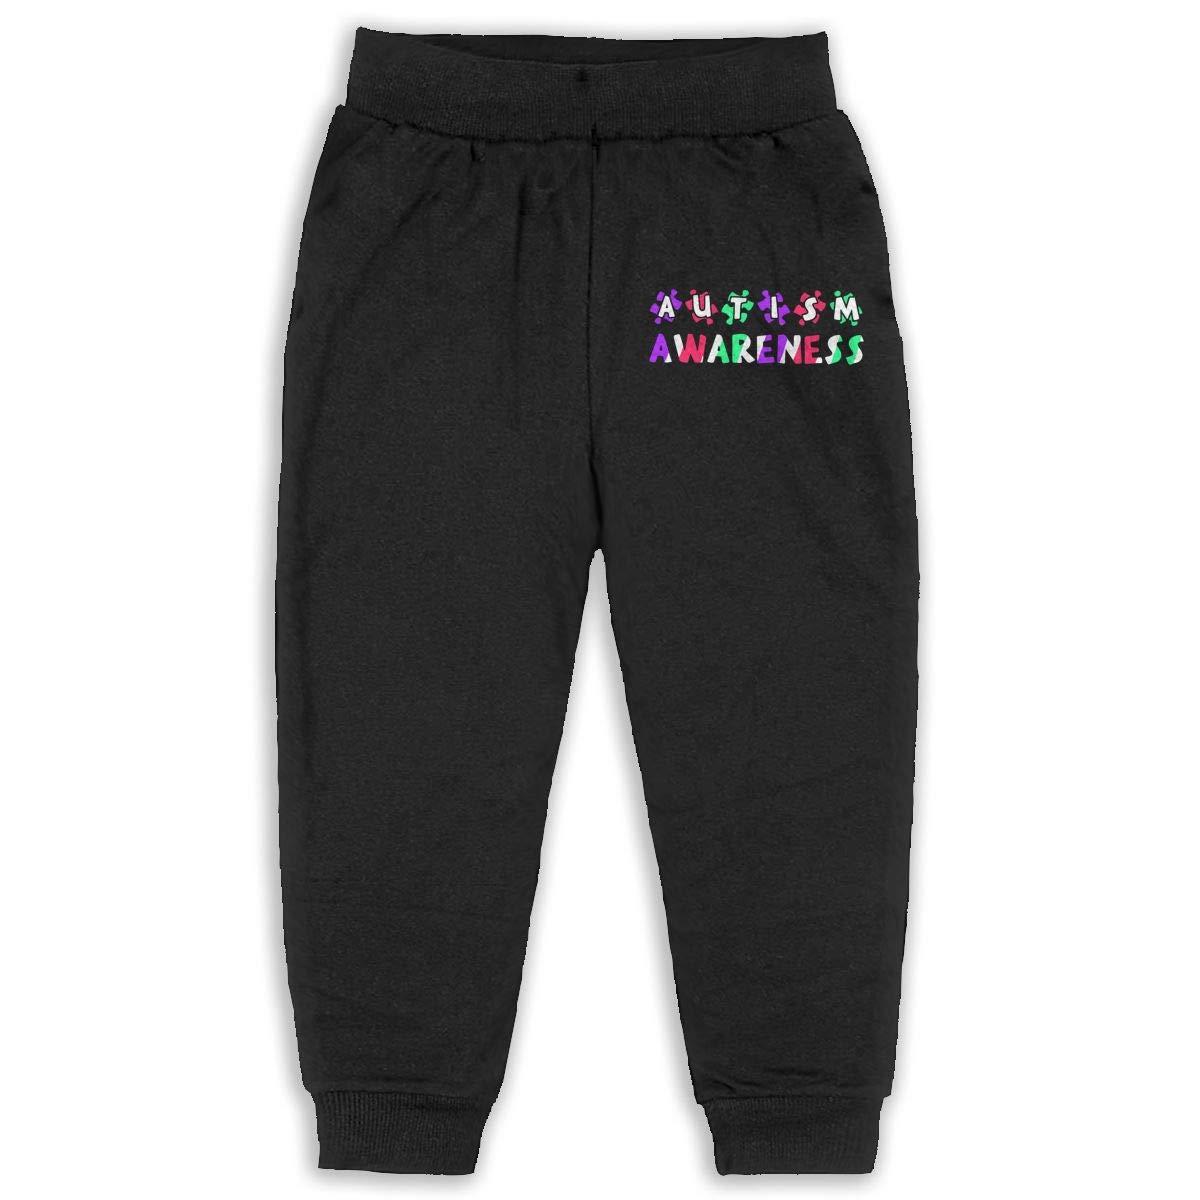 ELCW37K Kids /& Toddler Pants Soft Cozy Baby Sweatpants Autism Awareness Fleece Pants Jogger Pants